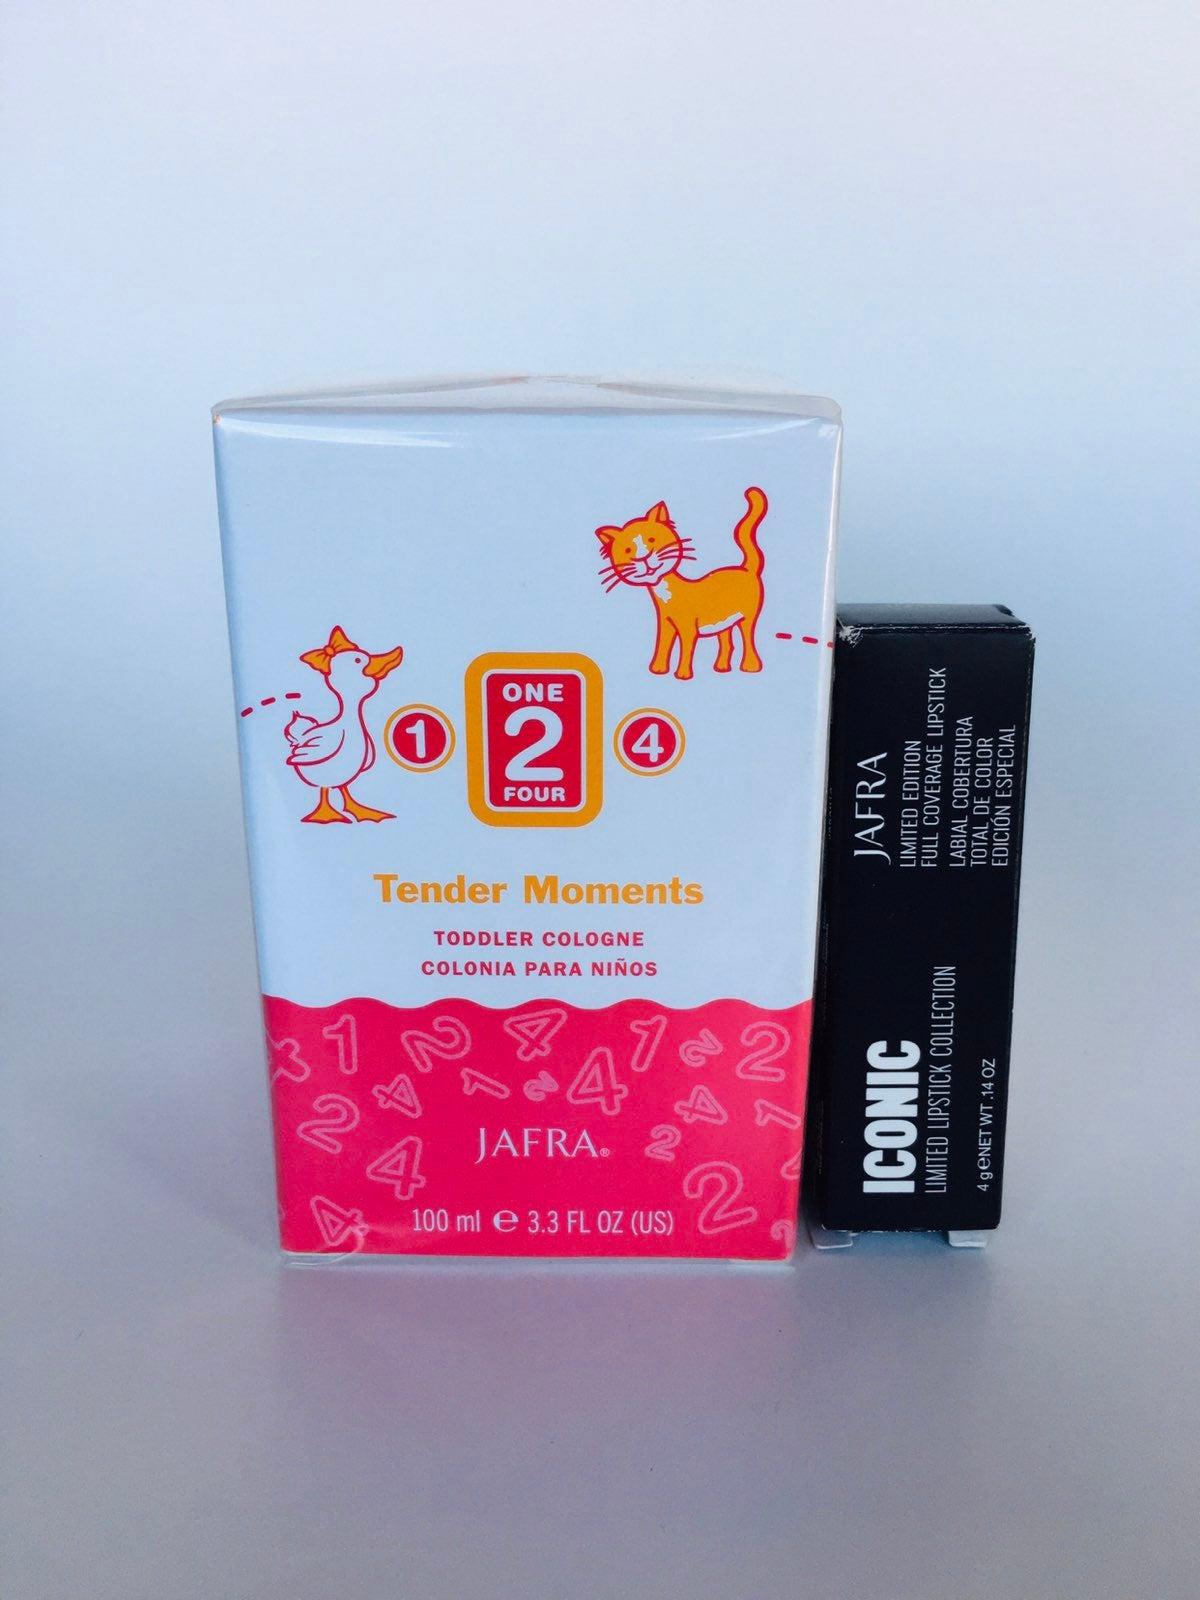 Tender Moments Baby Perfume 124 Jafra